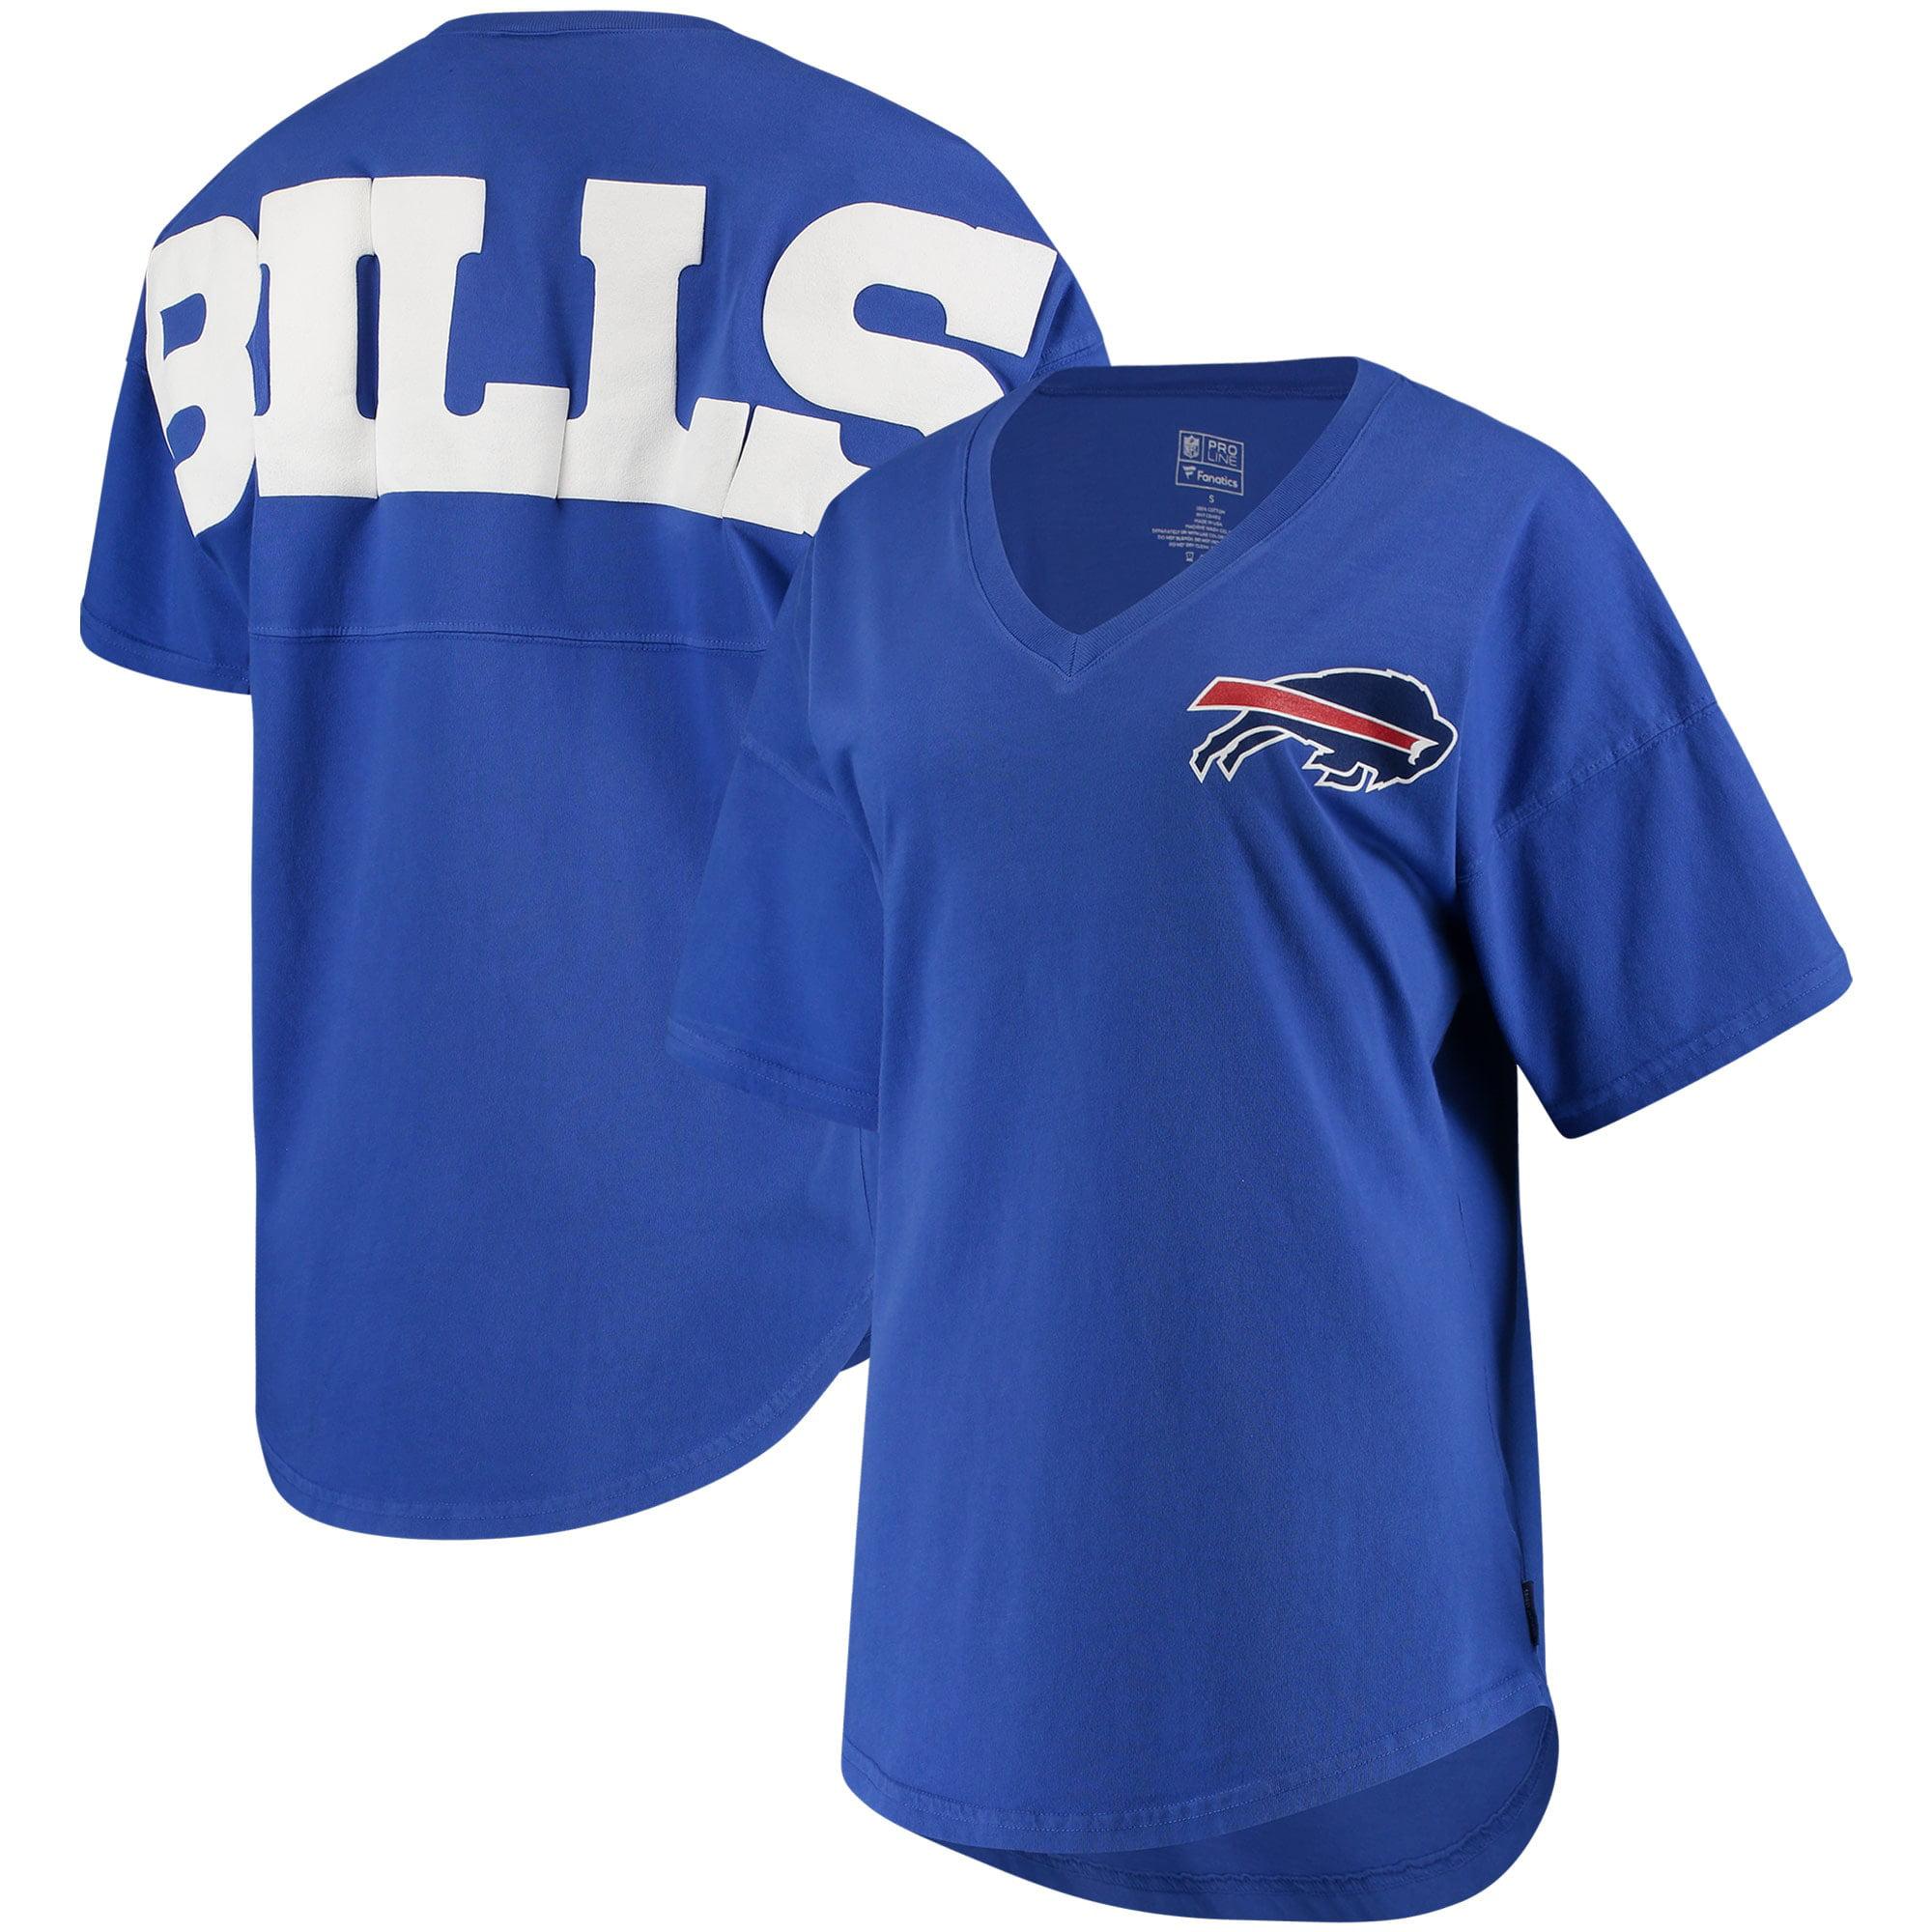 Buffalo Bills NFL Pro Line by Fanatics Branded Women's Spirit Jersey Goal Line V-Neck T-Shirt - Royal - Walmart.com